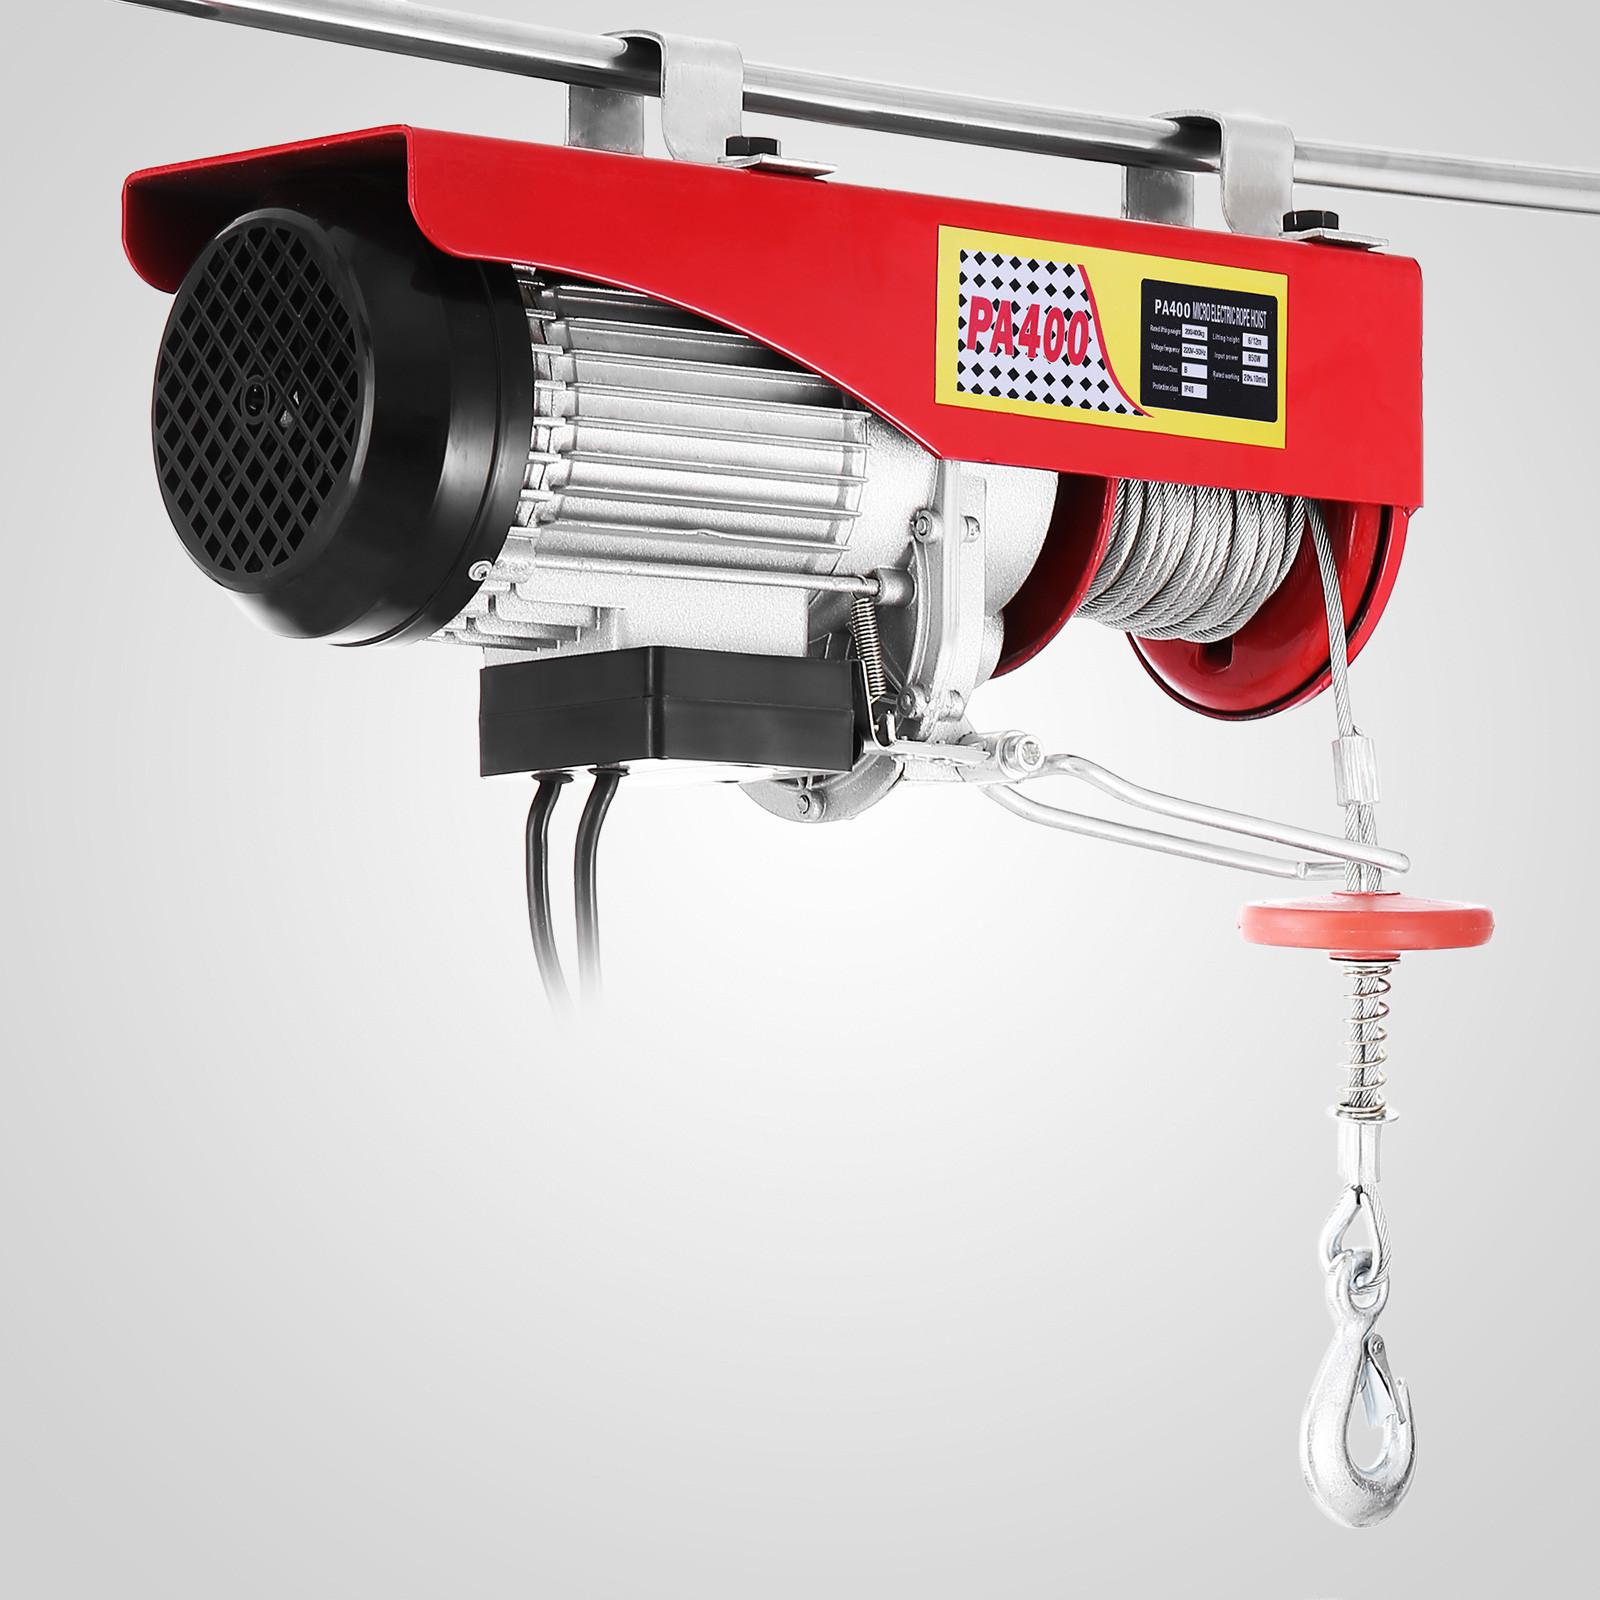 100kg-900kg-Electric-Hoist-Winch-Lifting-Engine-Crane-Cable-Lift-Hook-Garage miniature 29